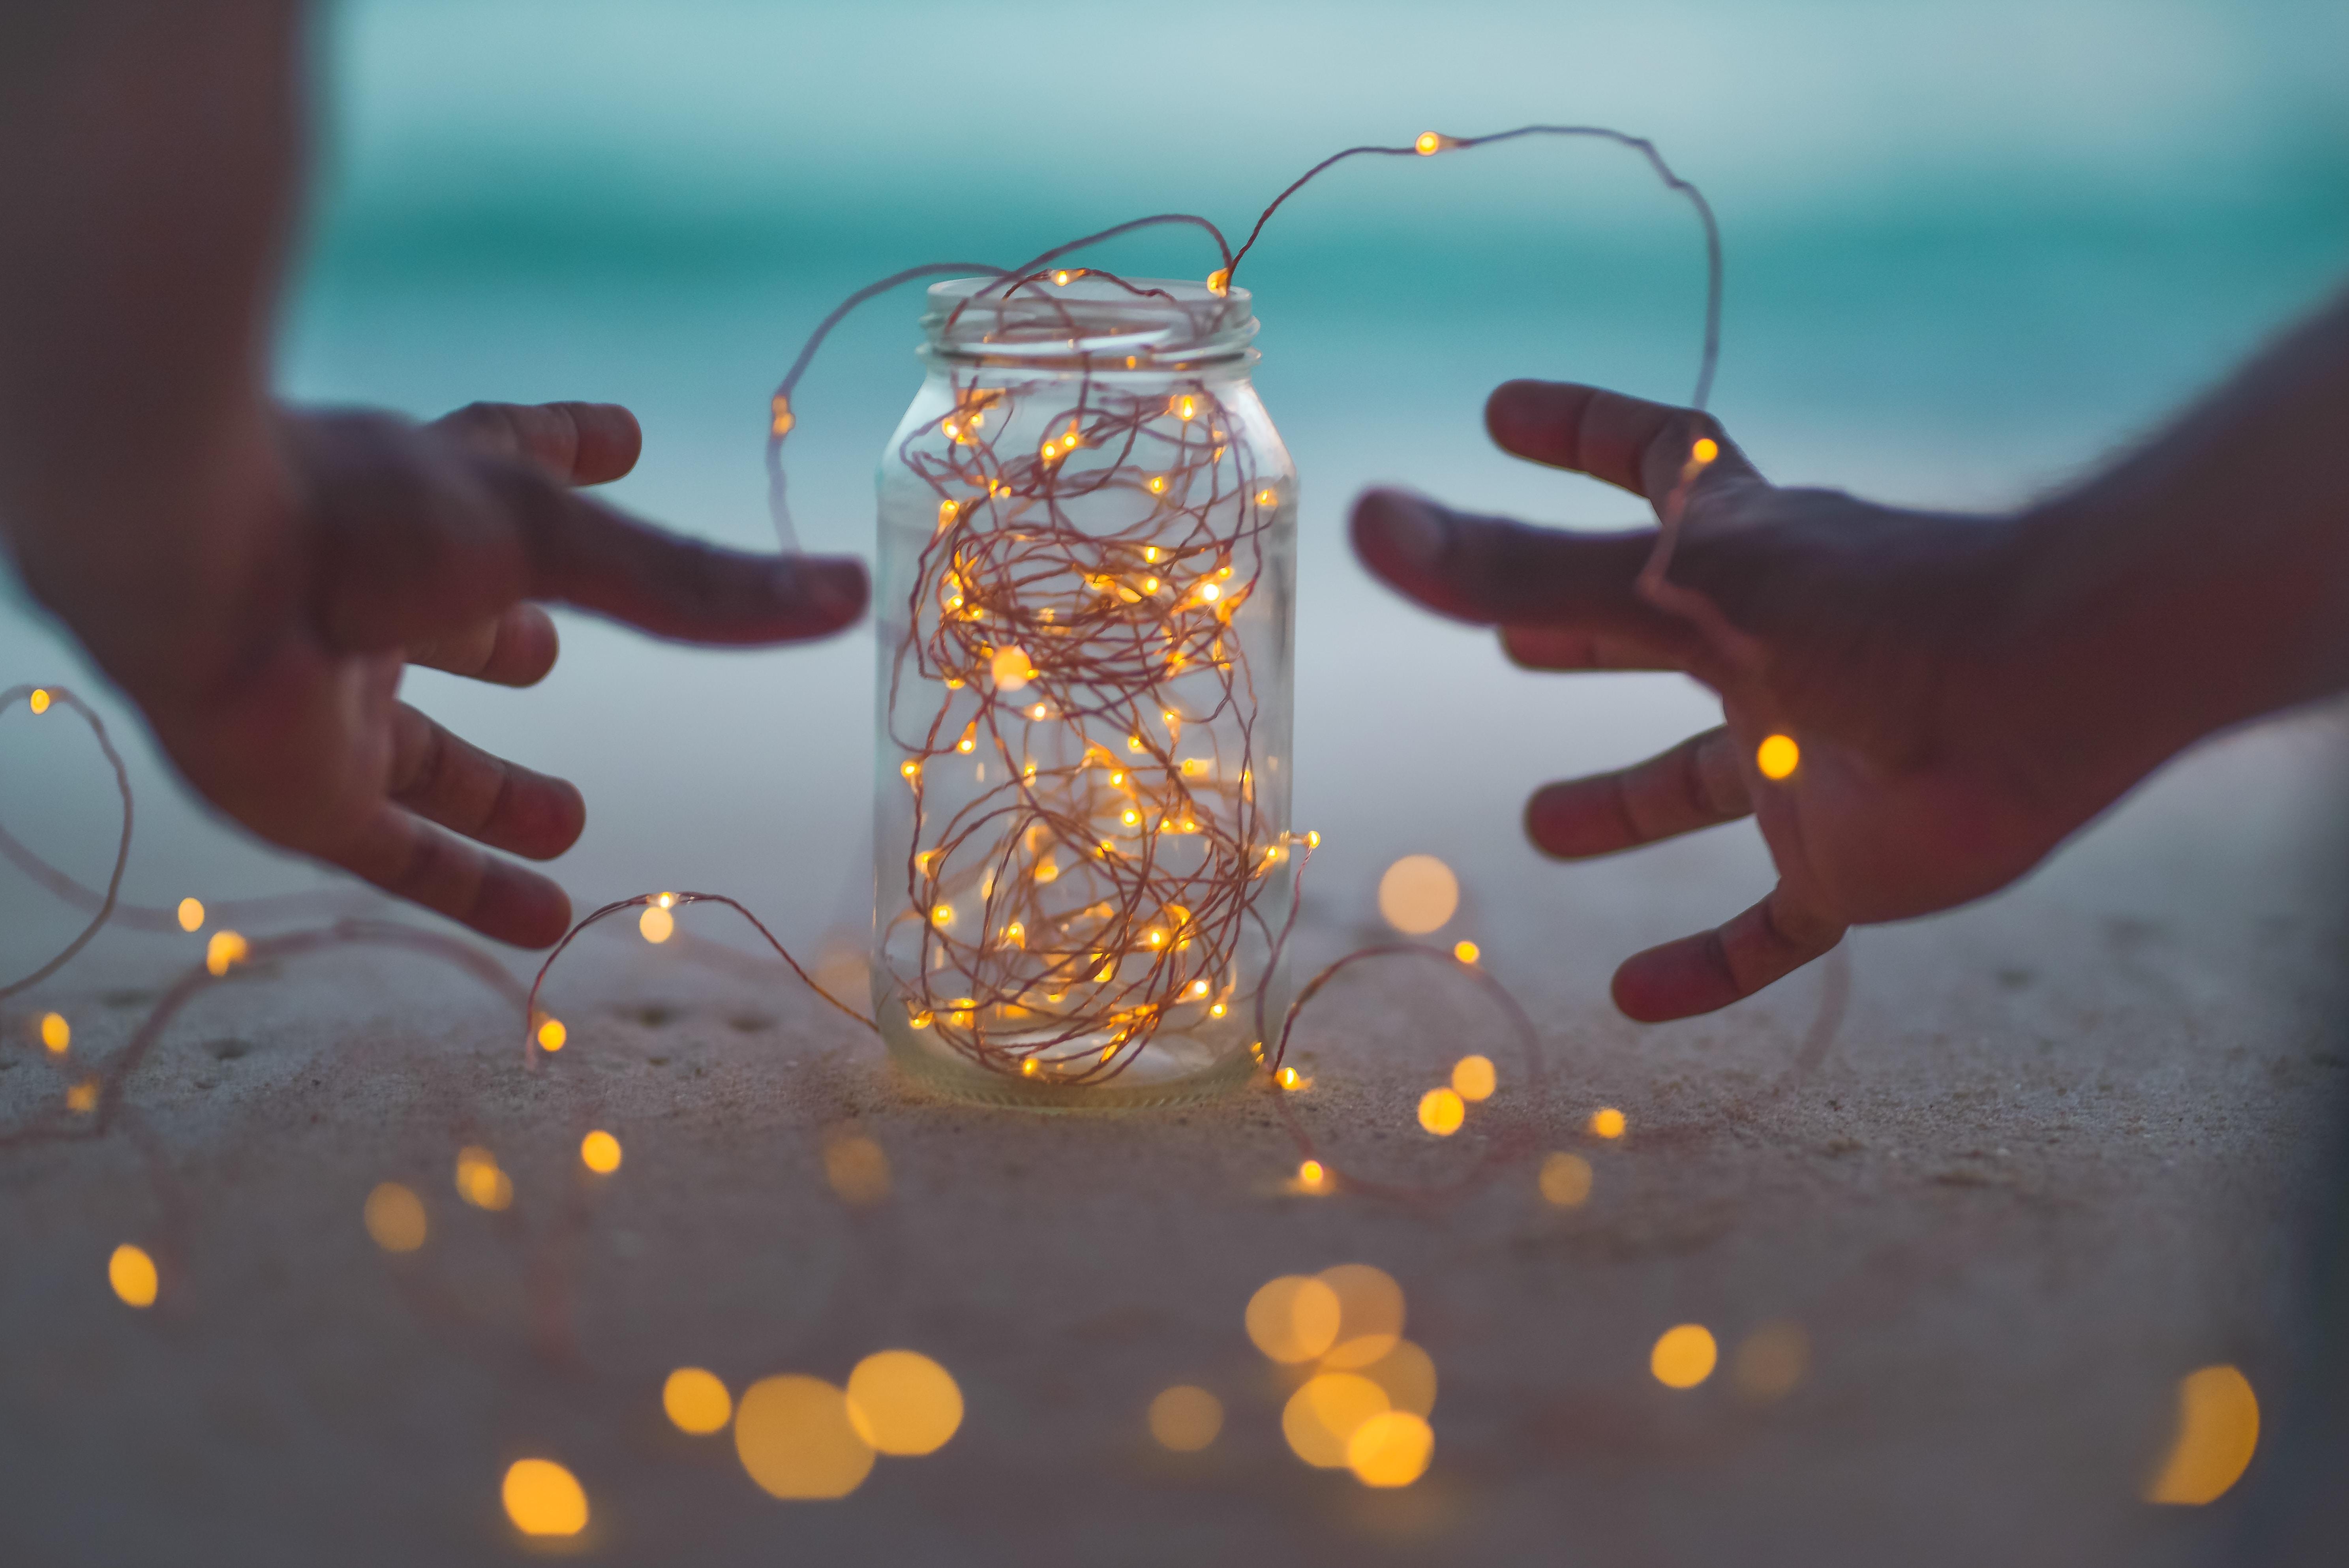 bokeh photography of lighted string lights inside Mason jar